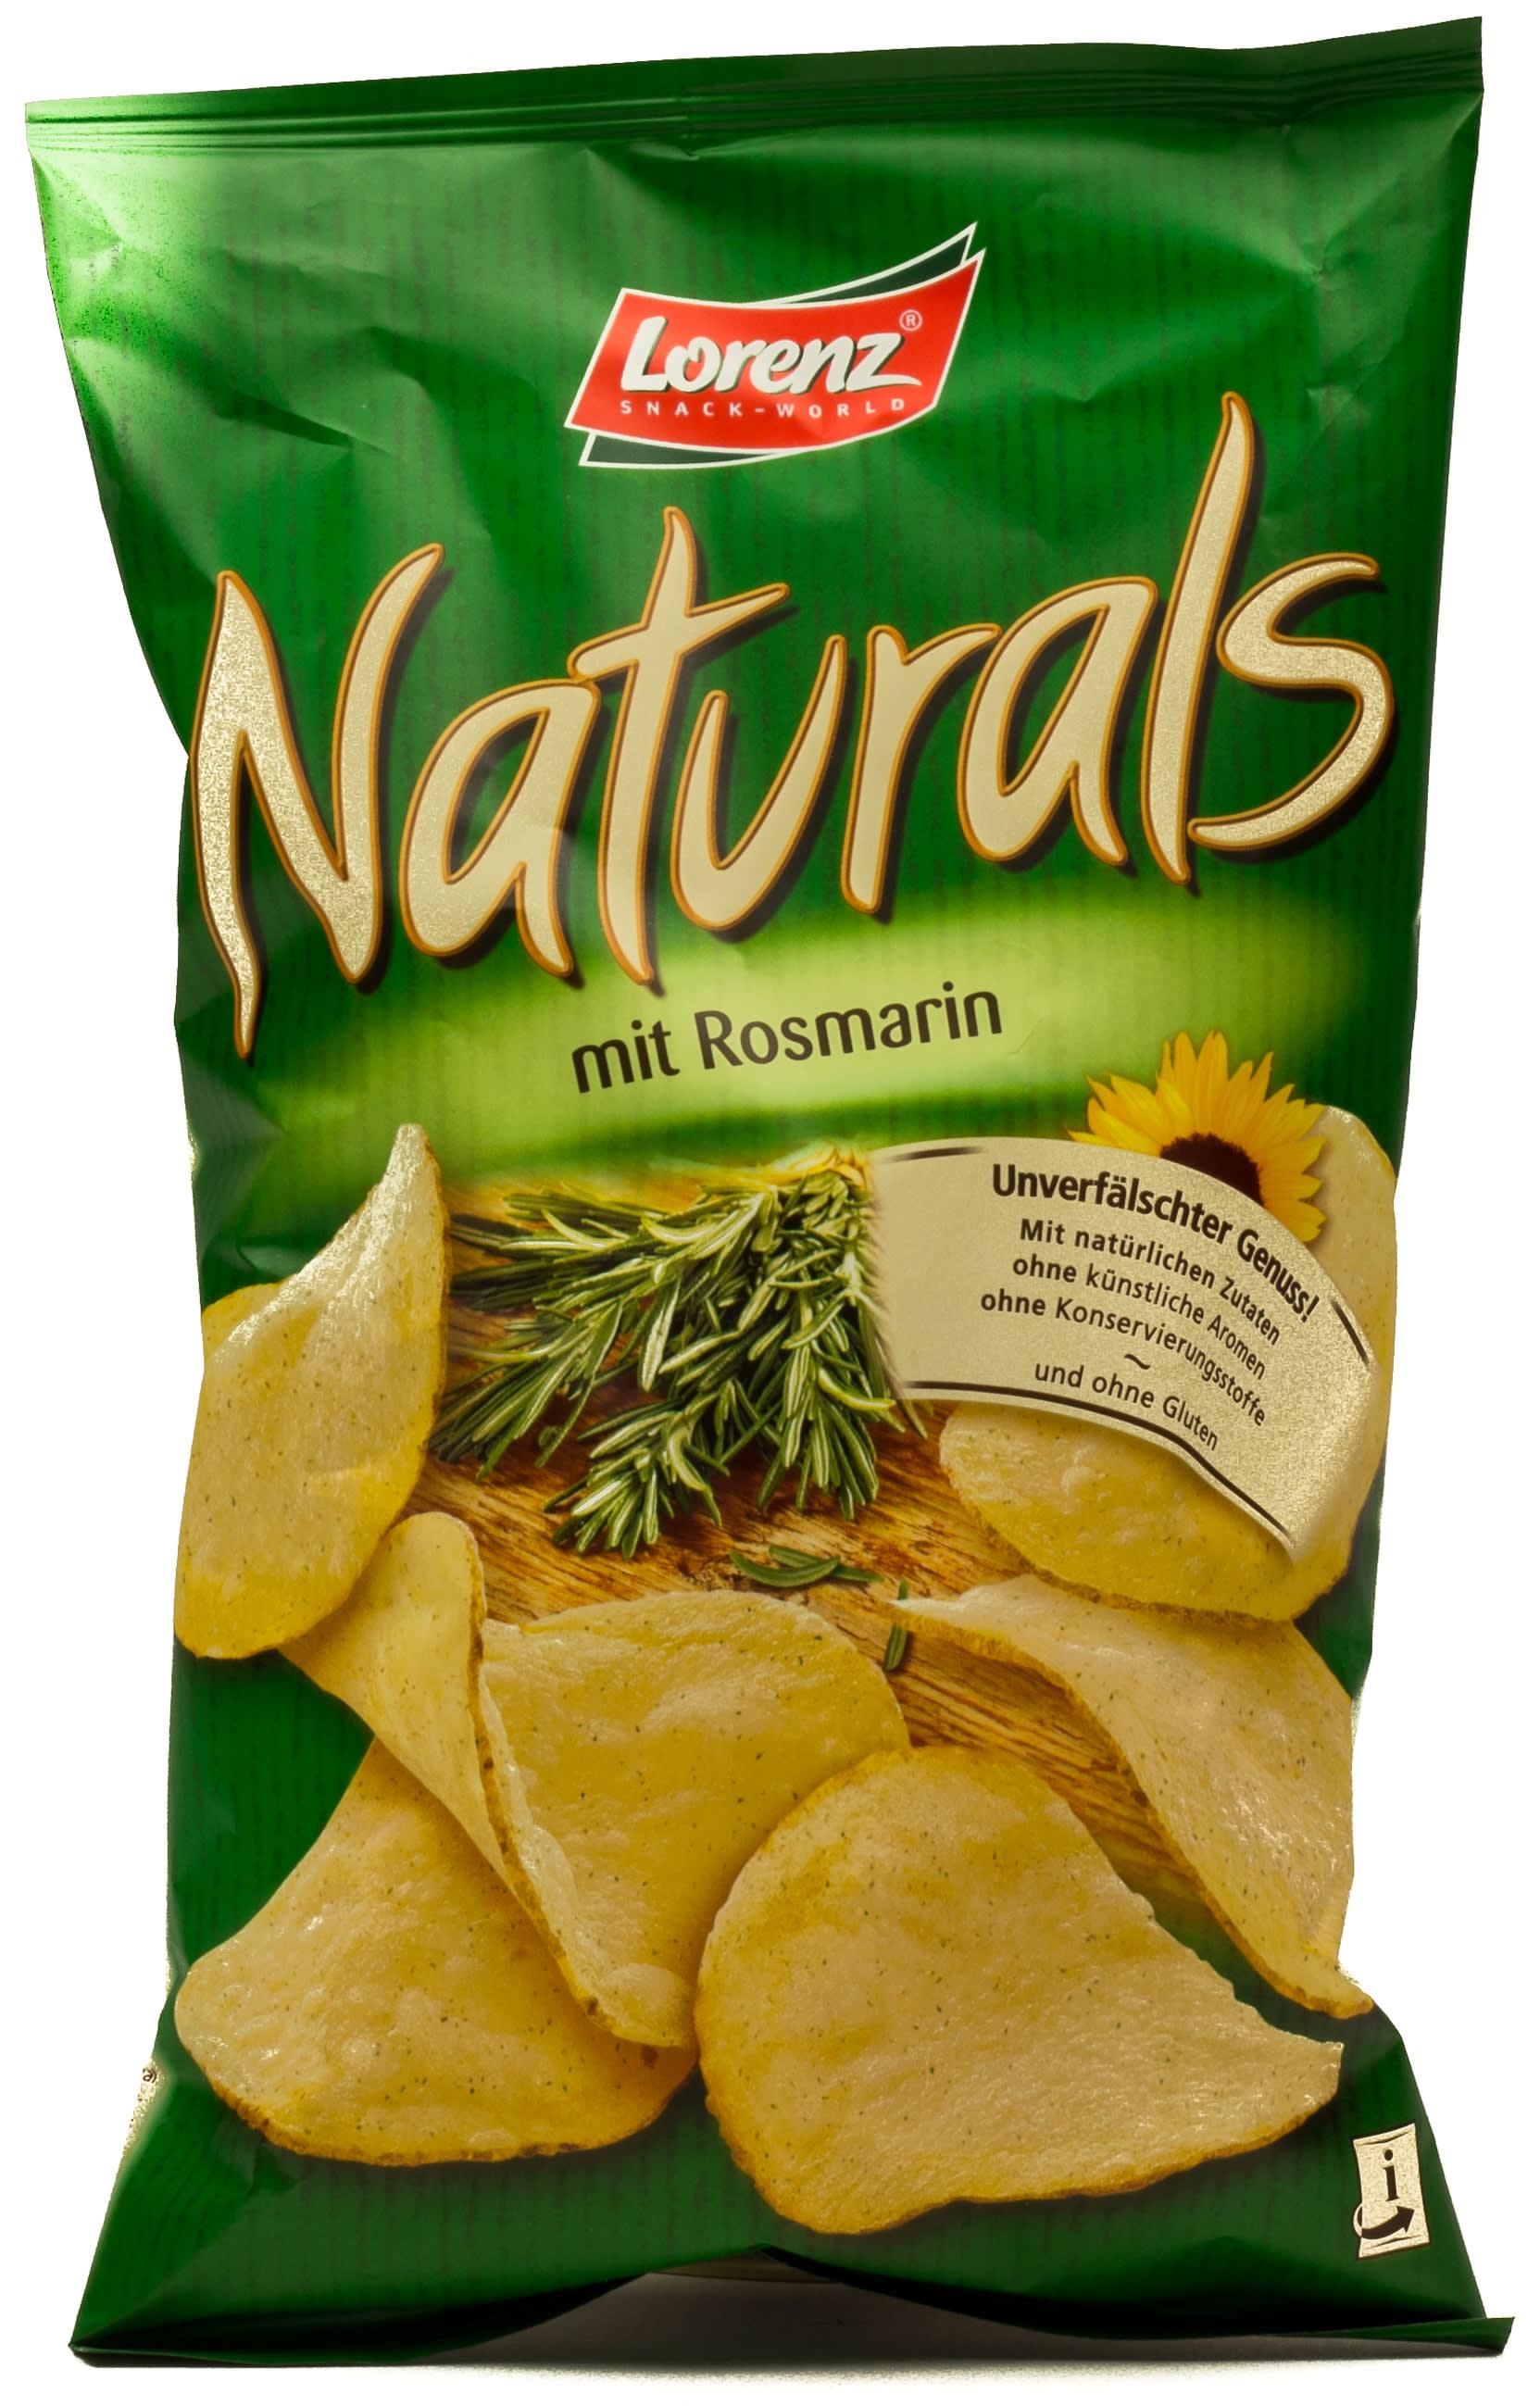 Naturals Rosmarin